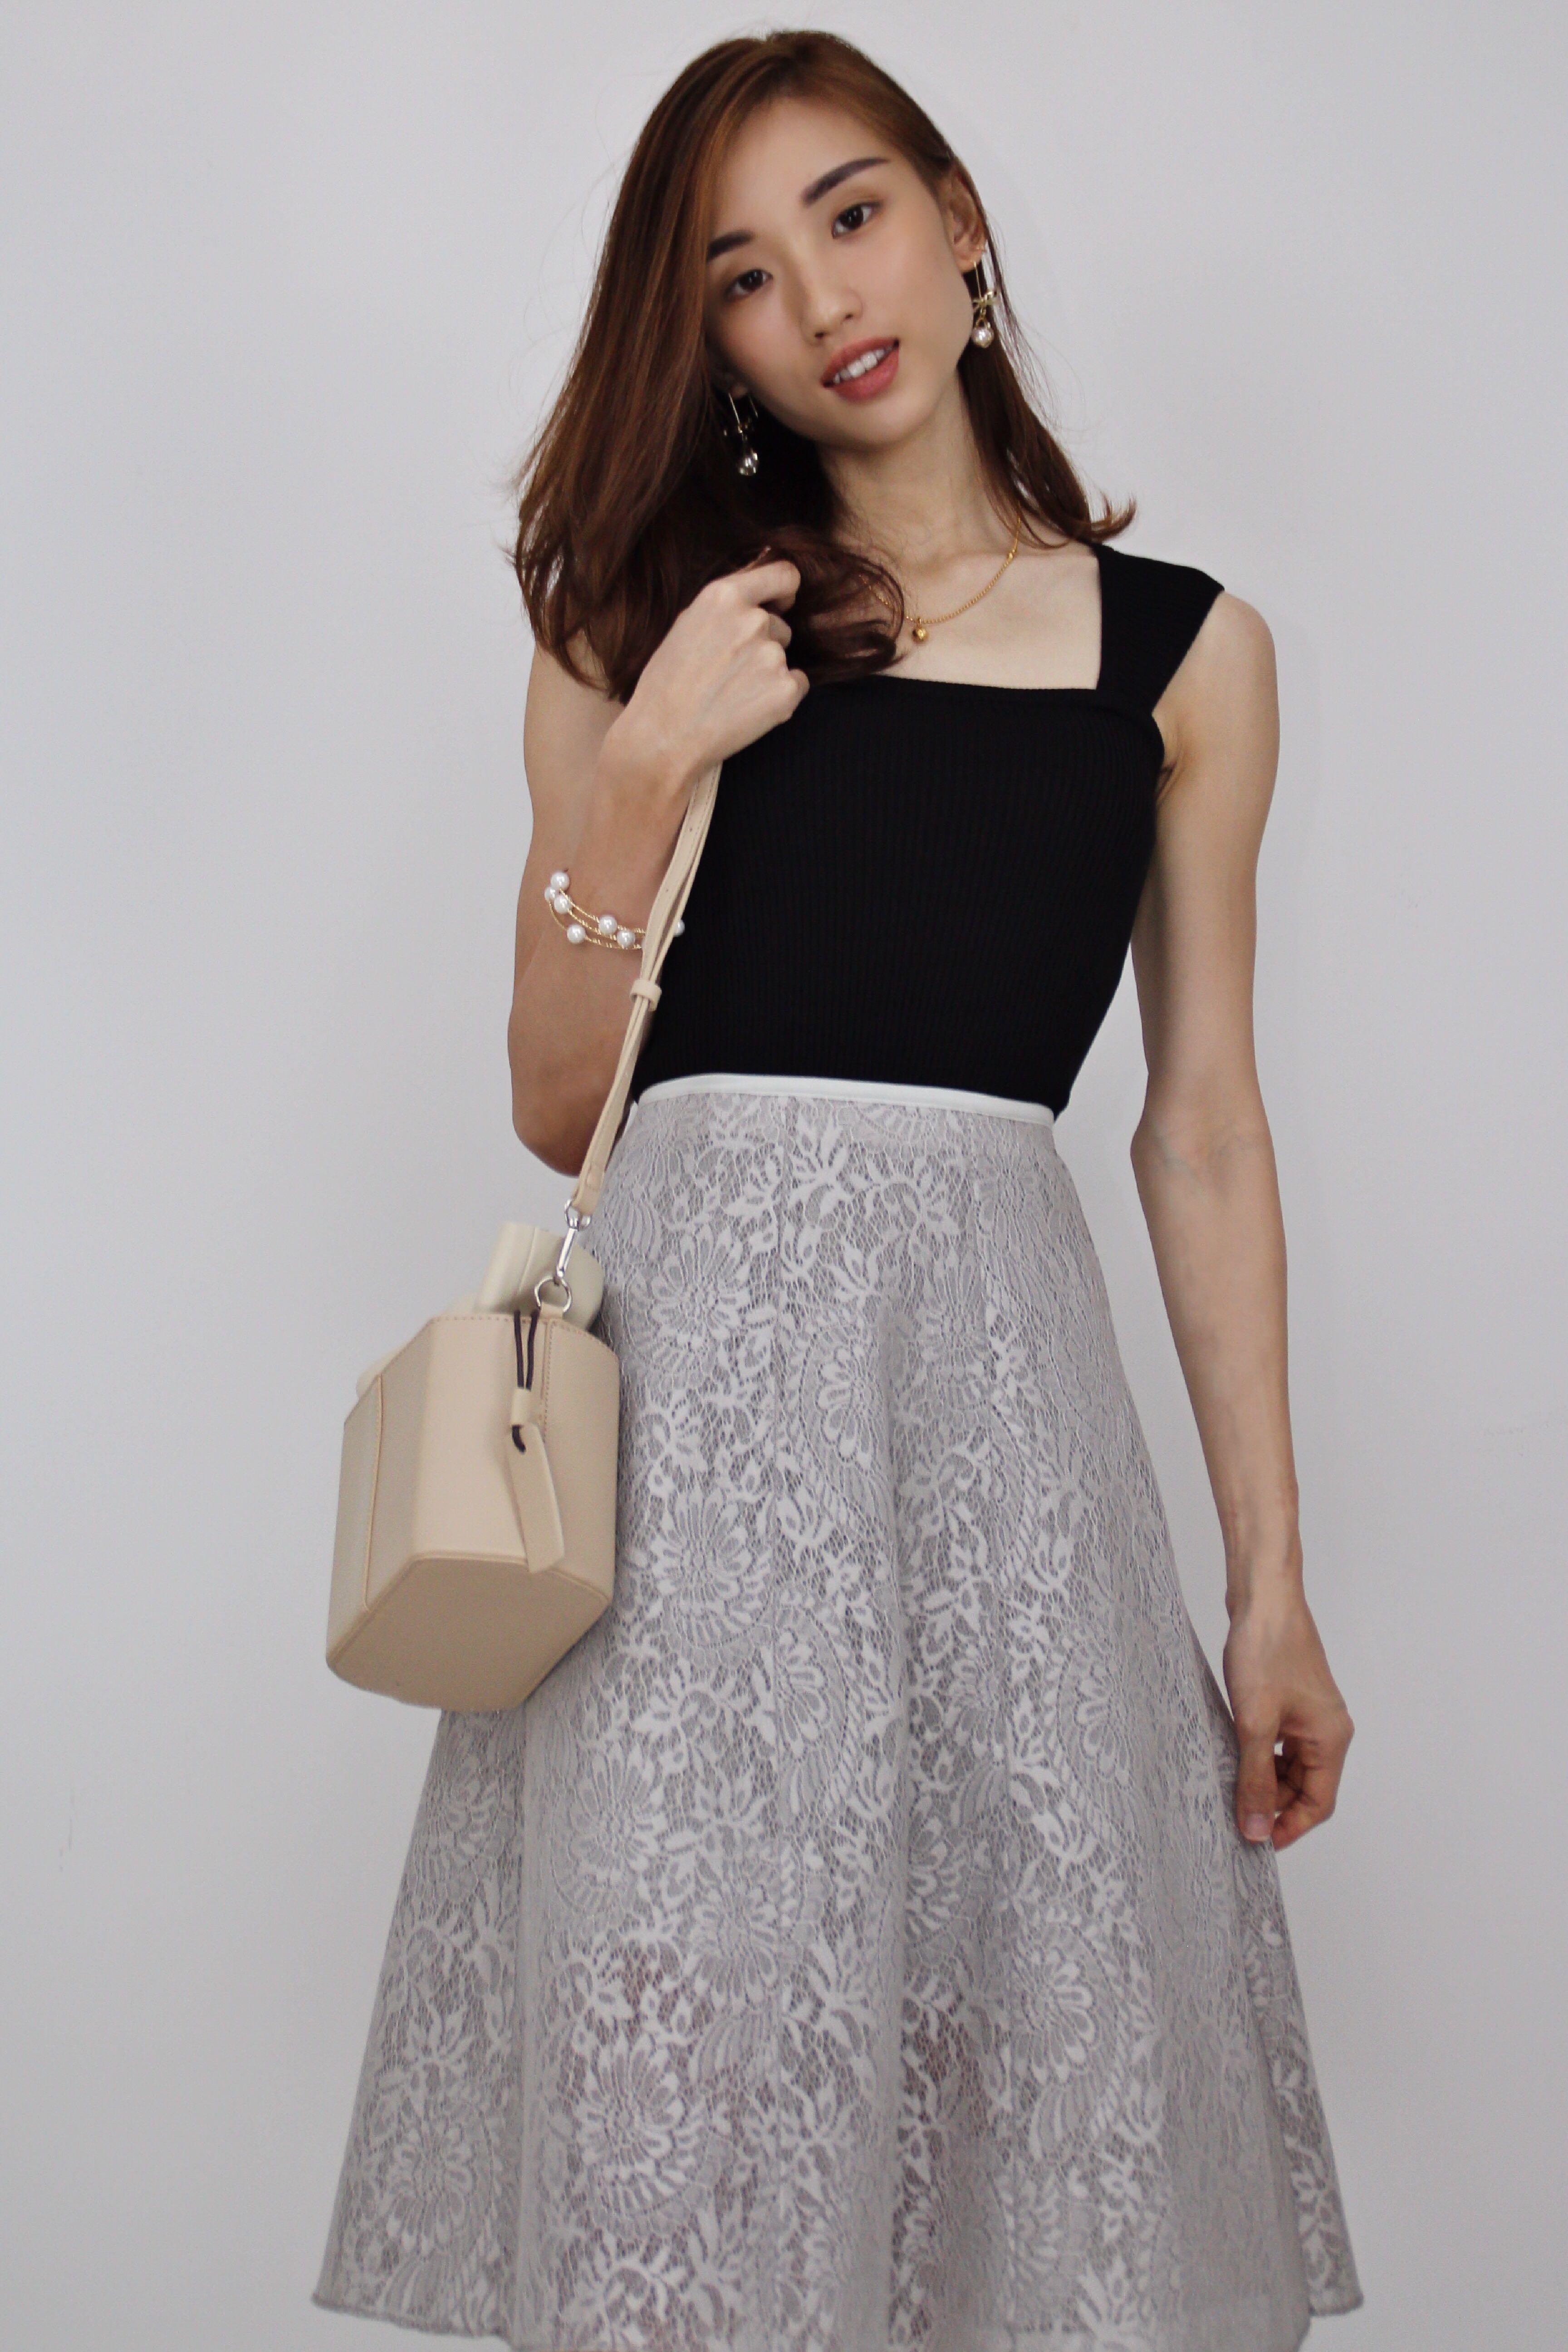 9aadc3d6f30e8 Nina Midi Lace Skirt, Women's Fashion, Clothes, Dresses & Skirts on ...